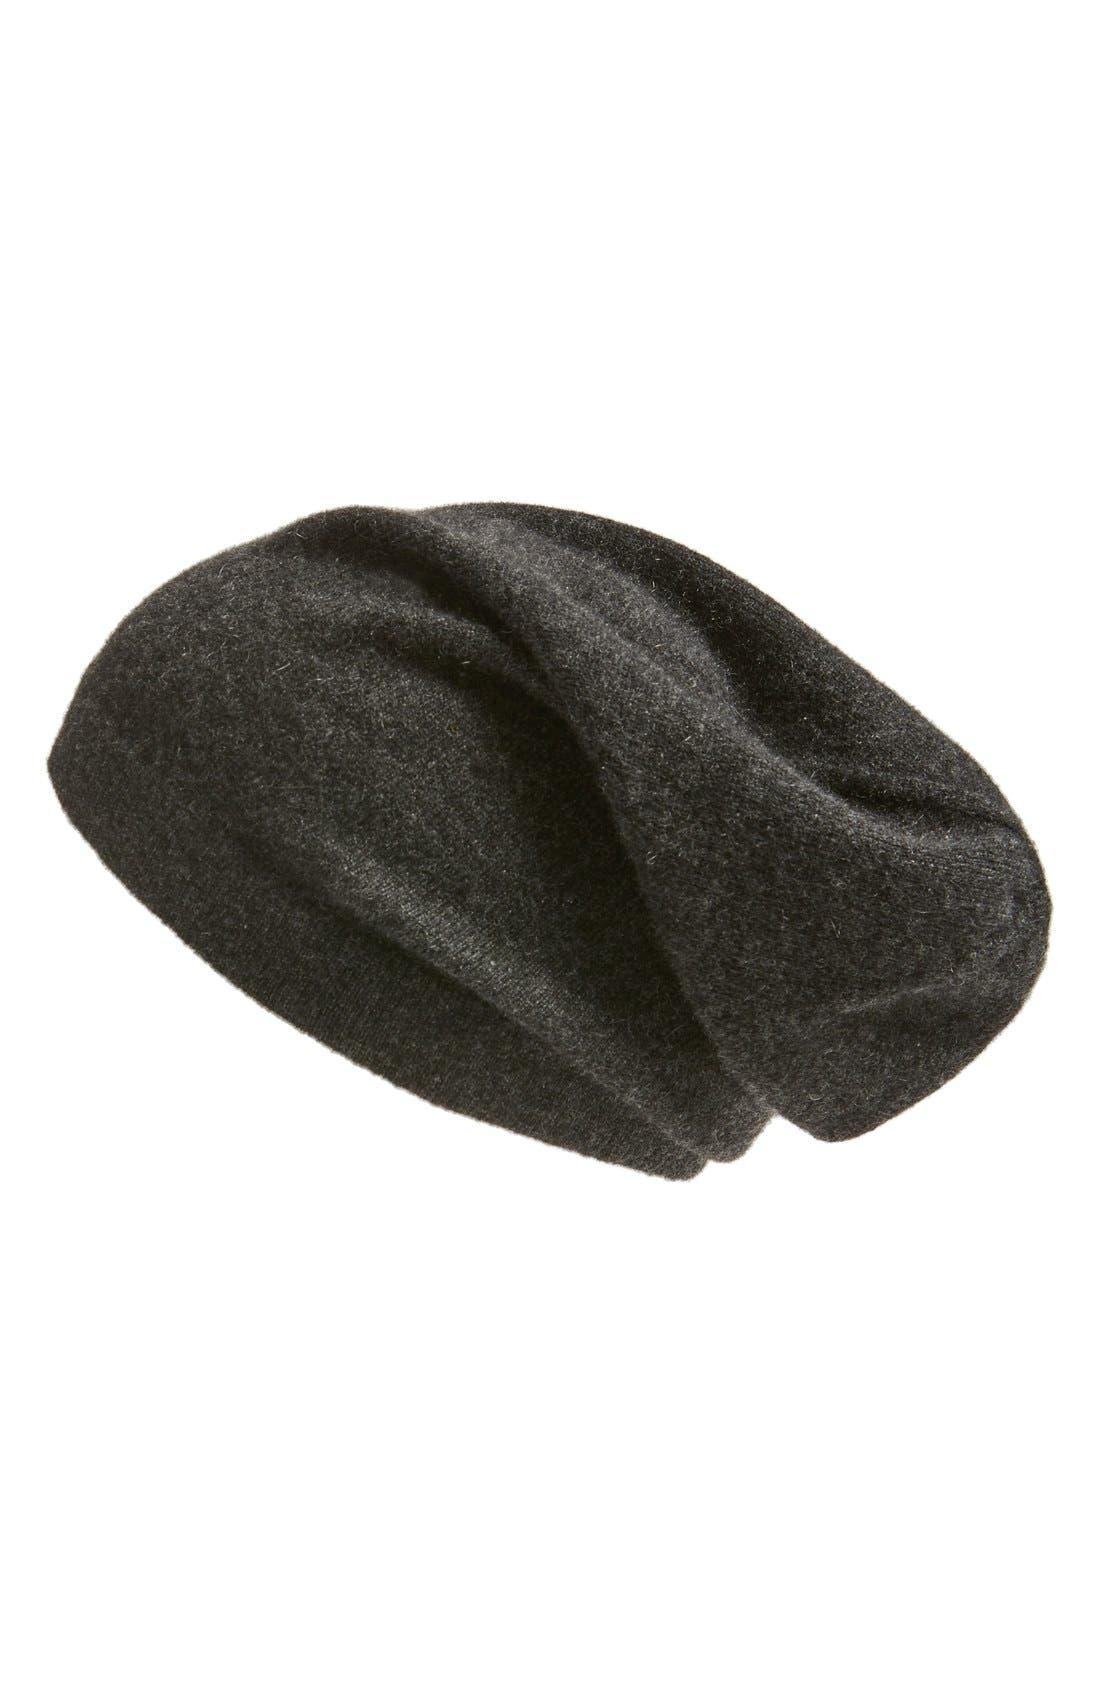 Alternate Image 1 Selected - Nordstrom Men's Shop Cashmere Beanie